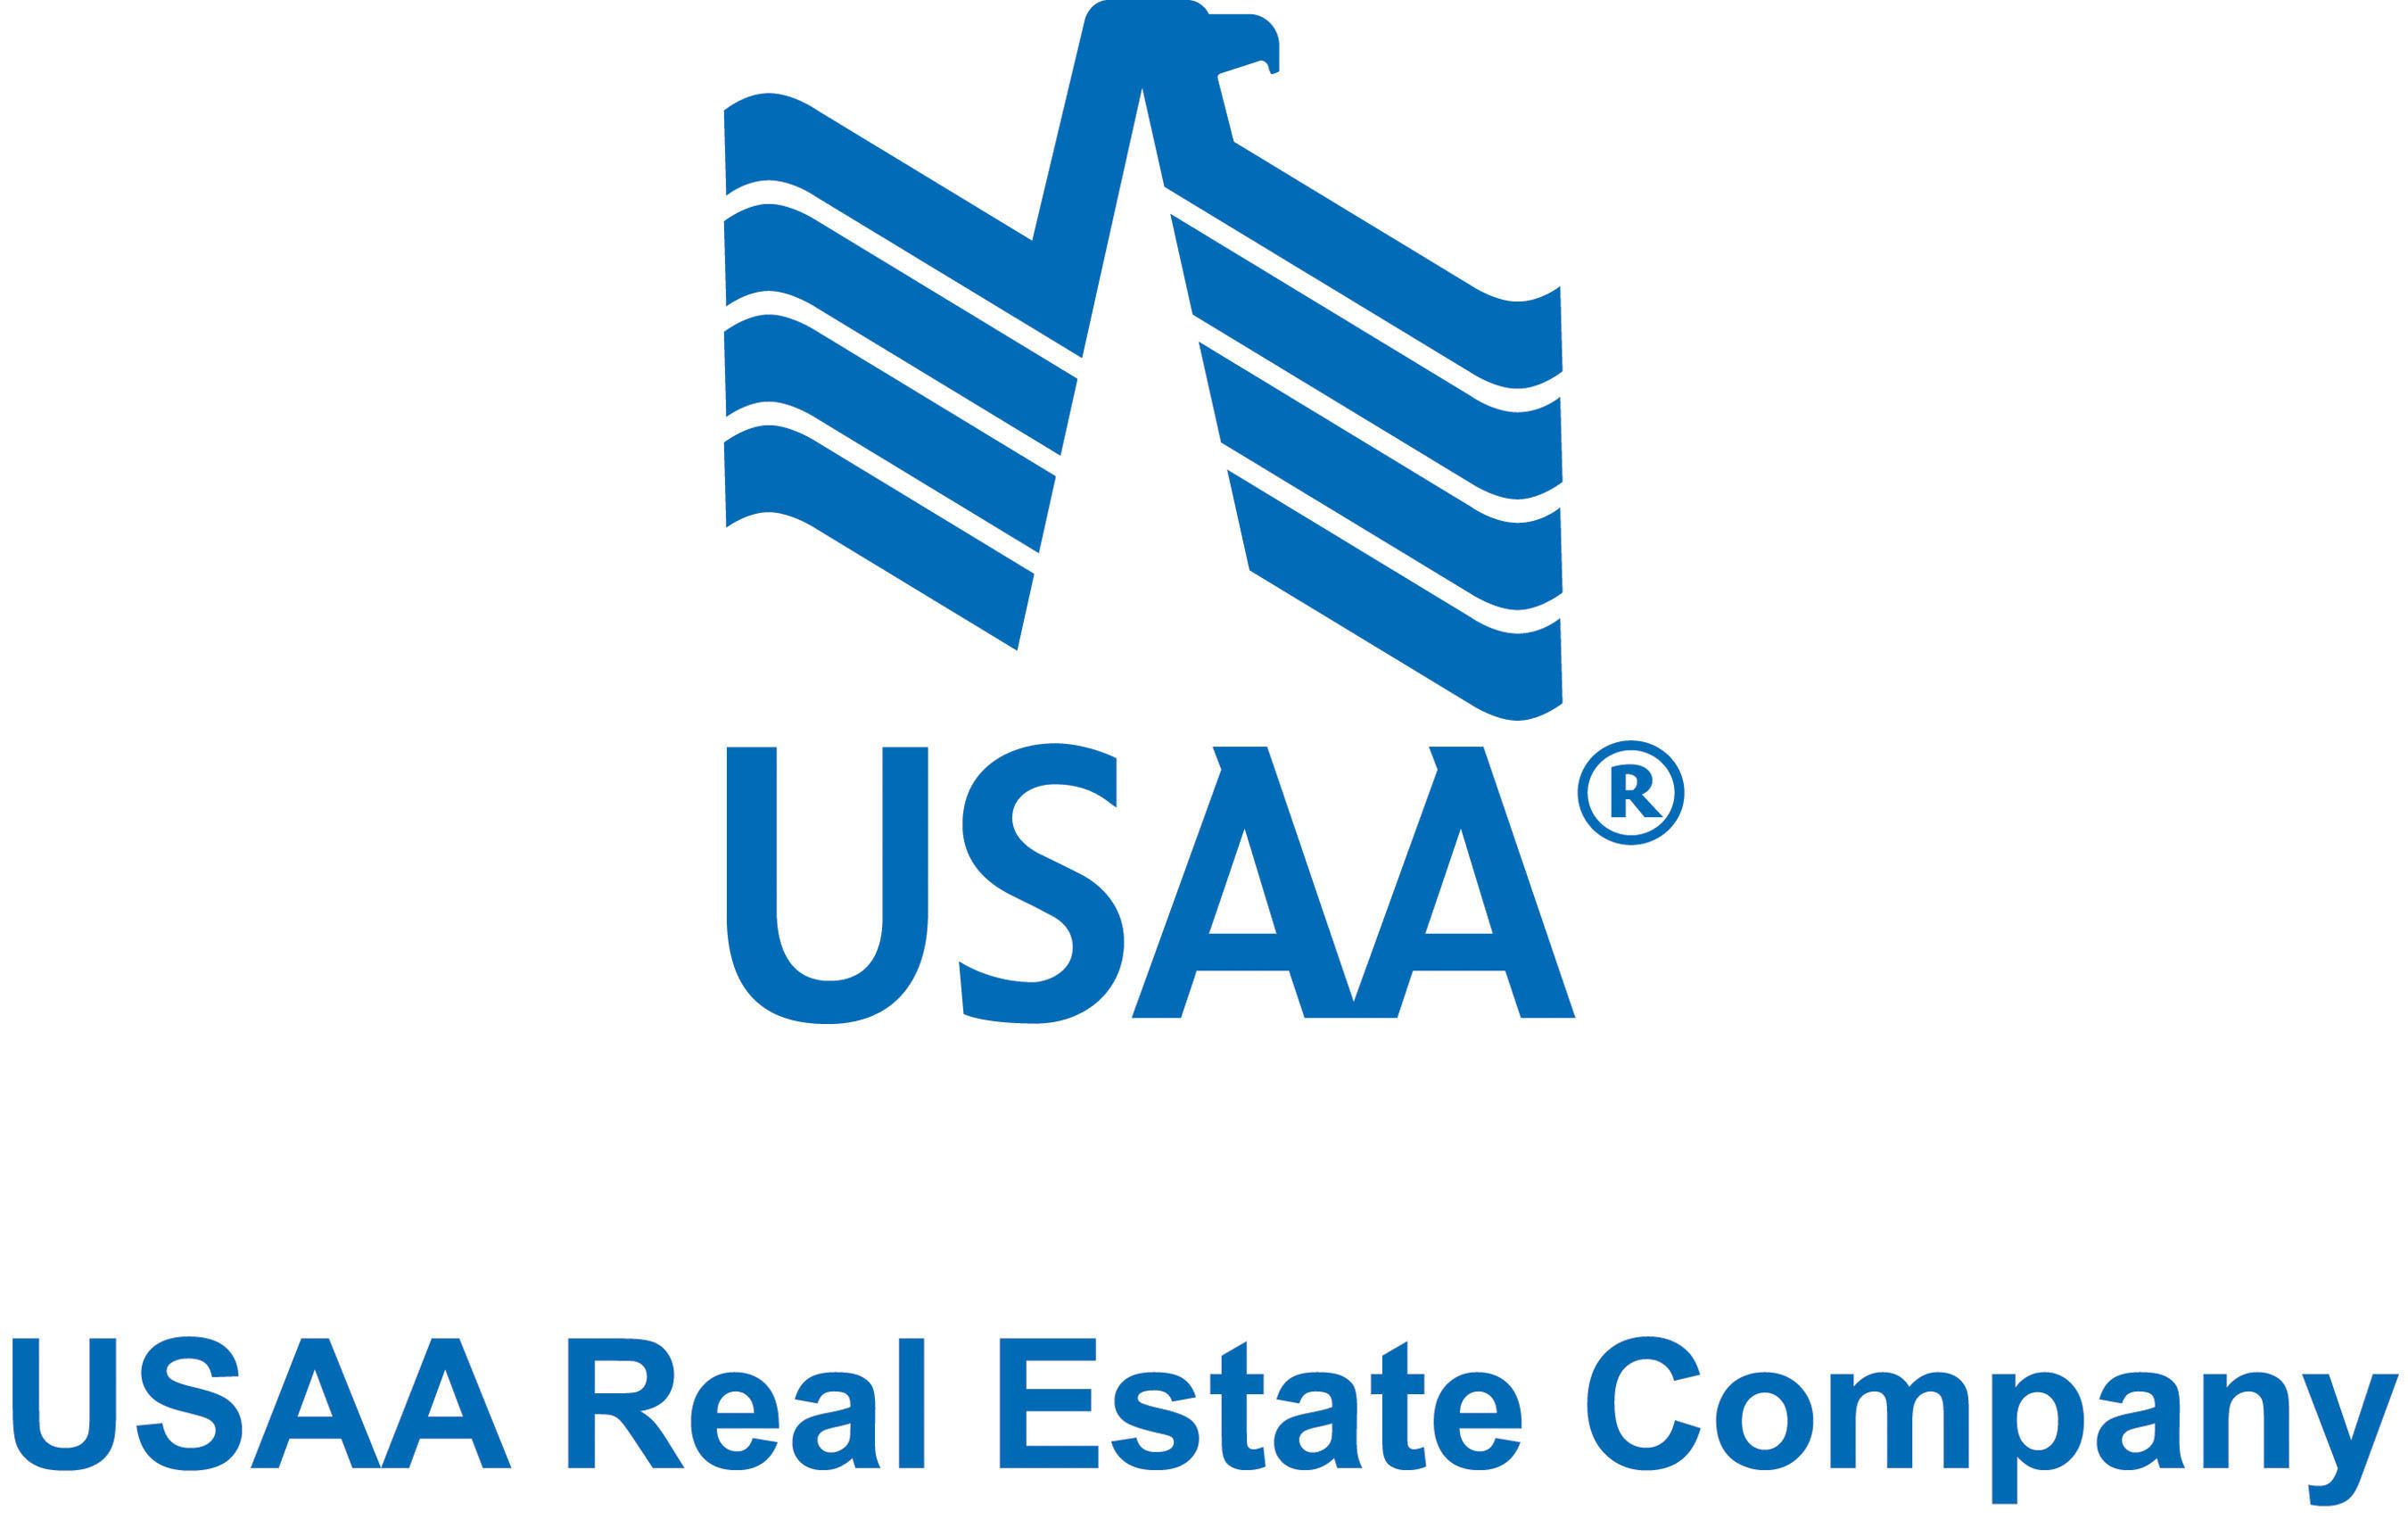 Usaa - Usaa Real Estate Company Logo